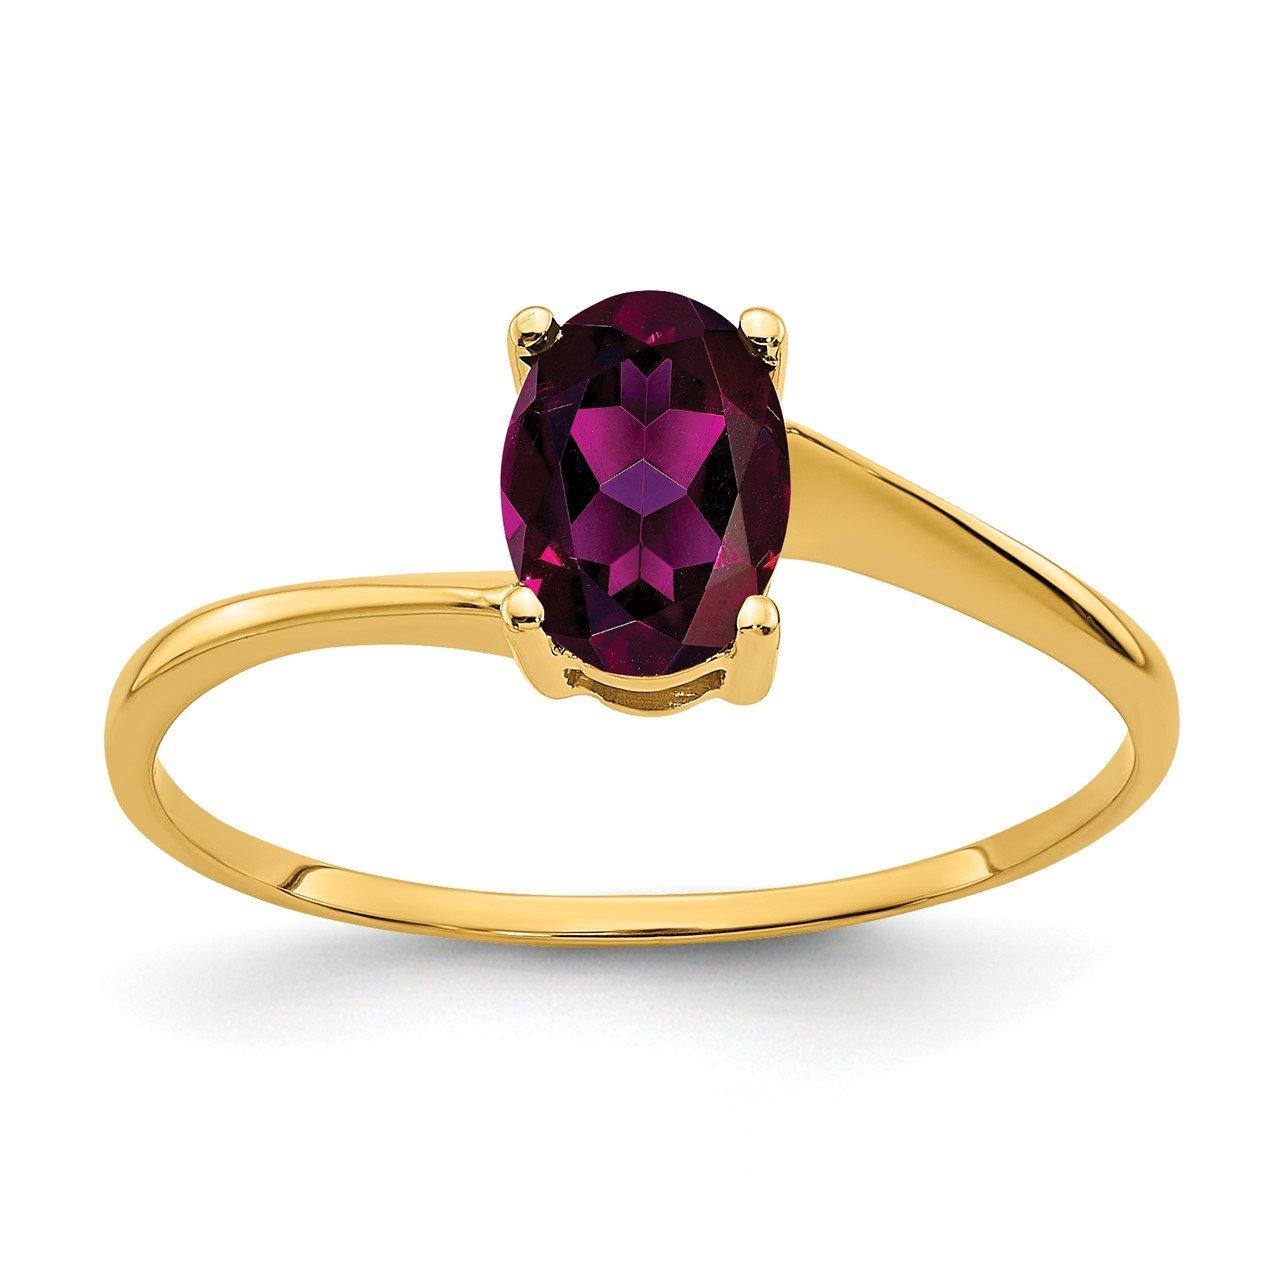 14k 7x5mm Oval Rhodolite Garnet ring